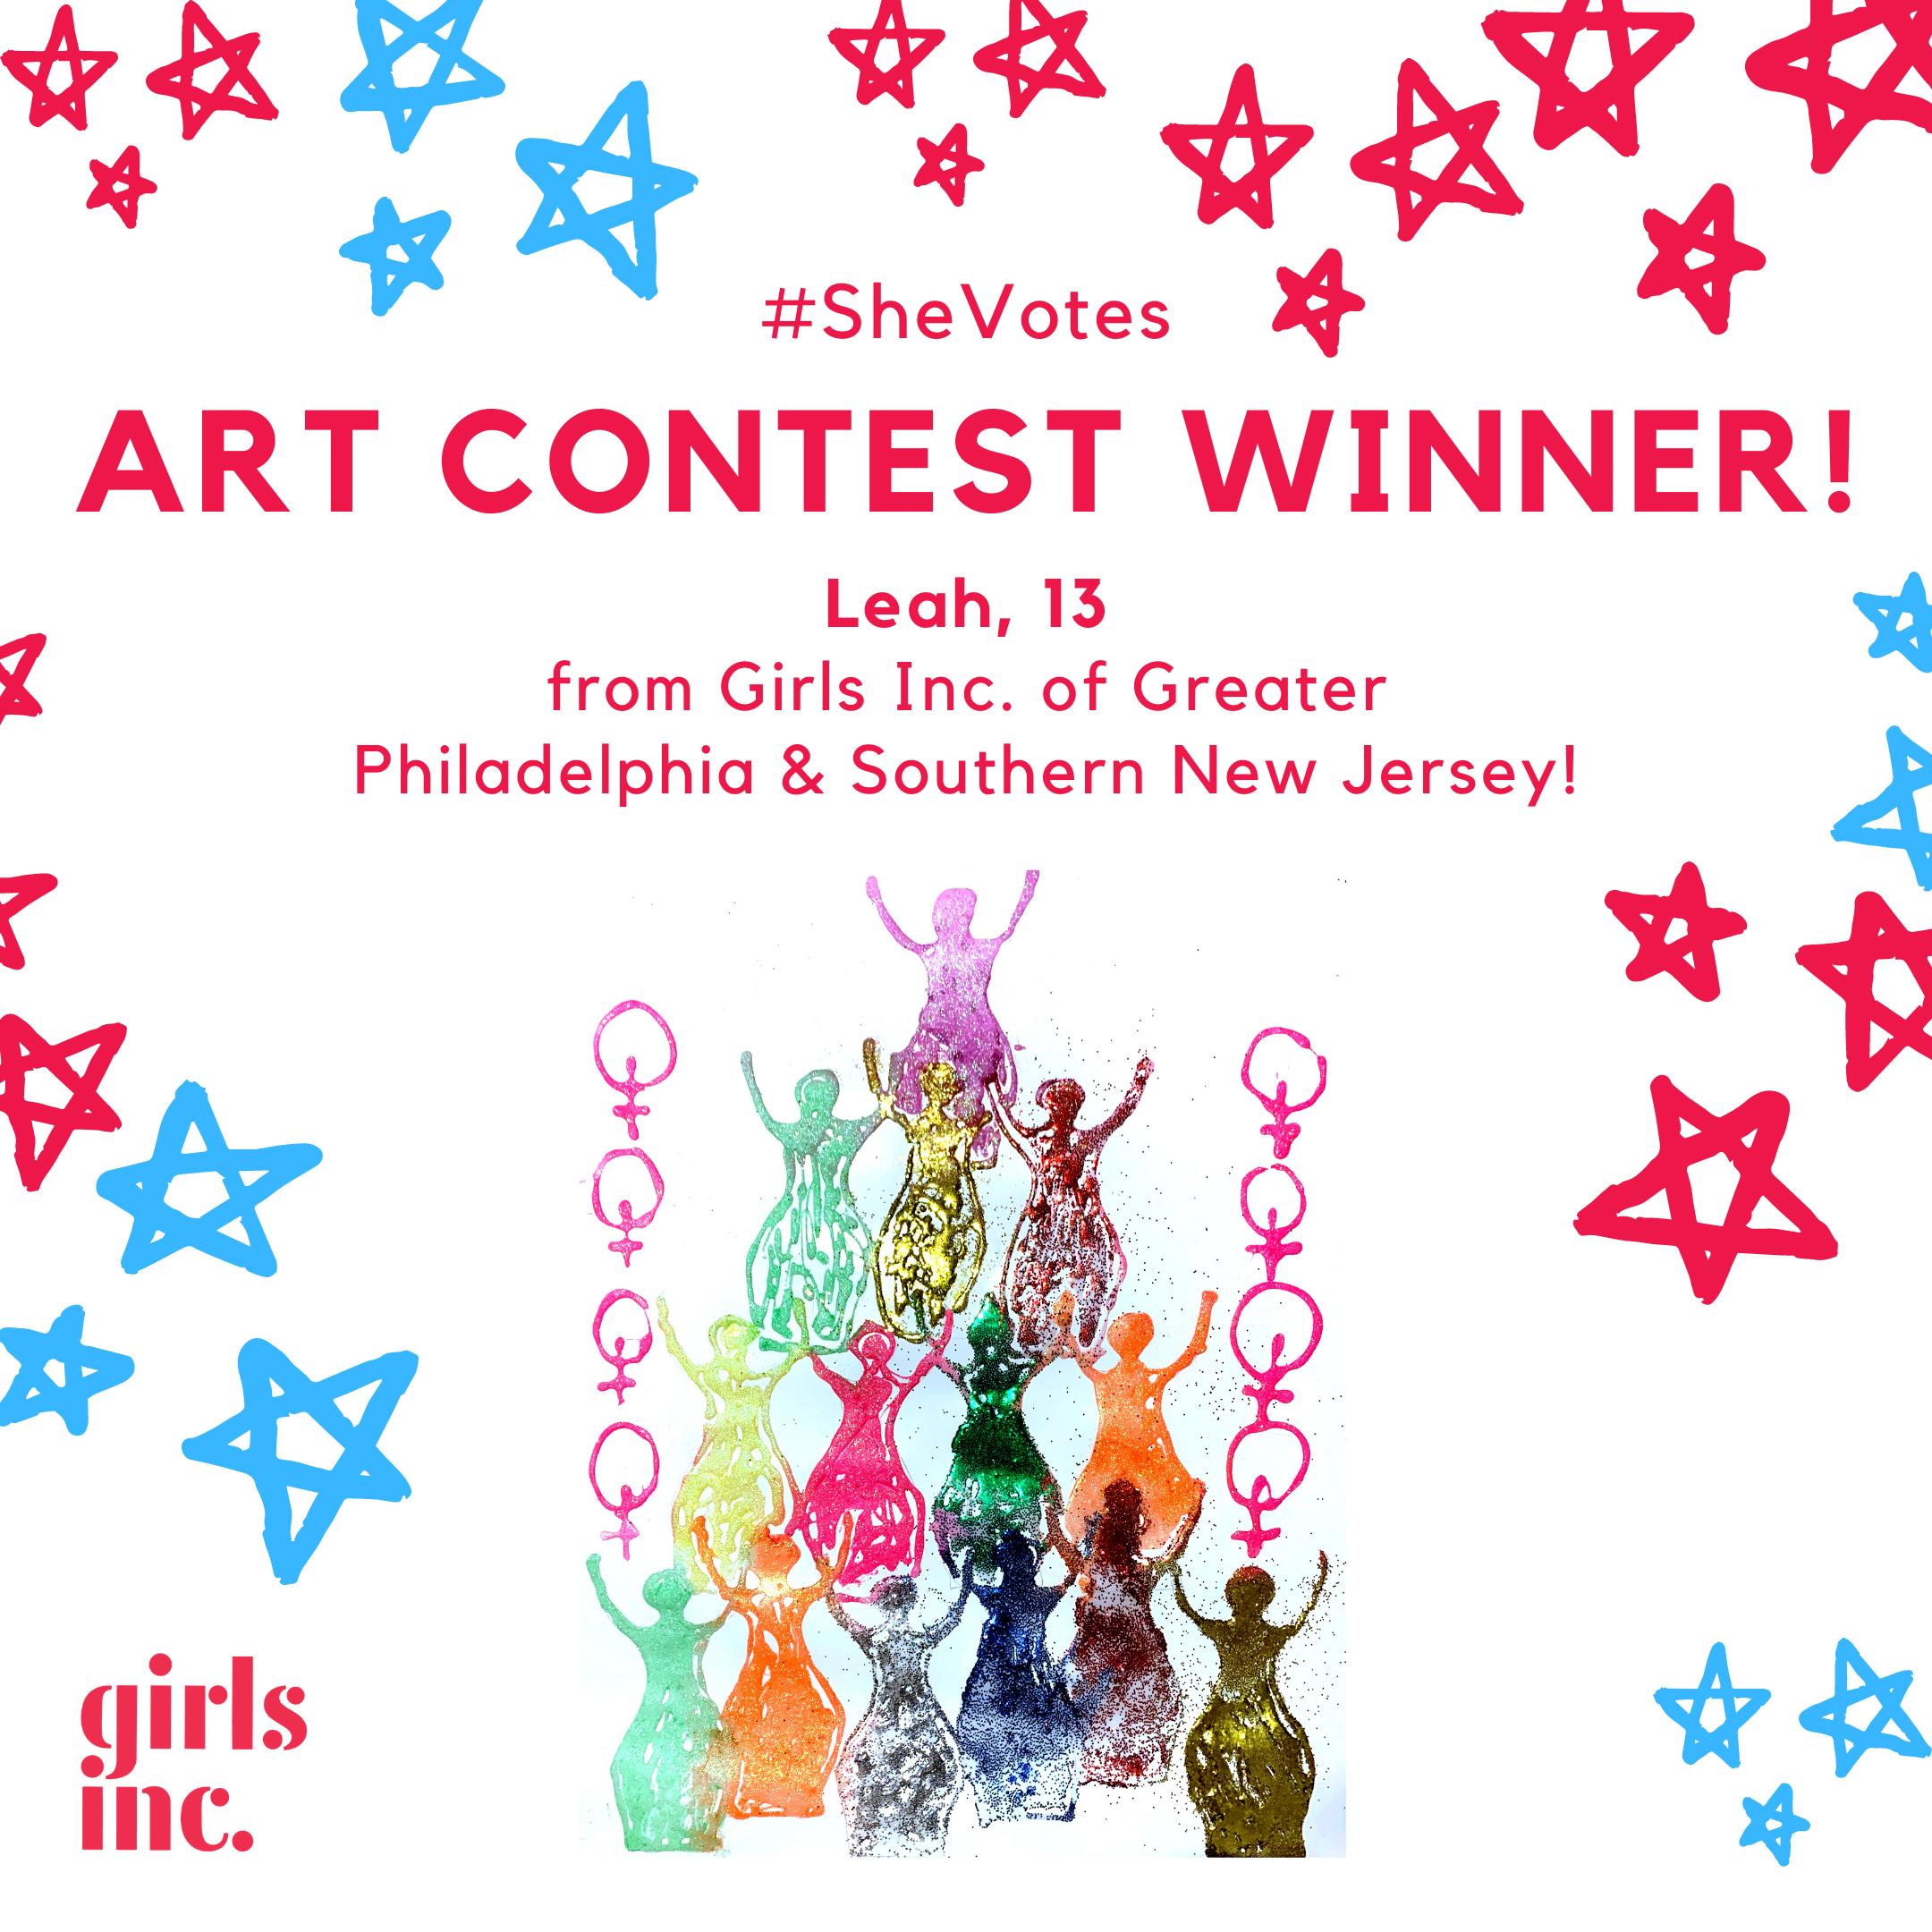 Art contest winner - Leah